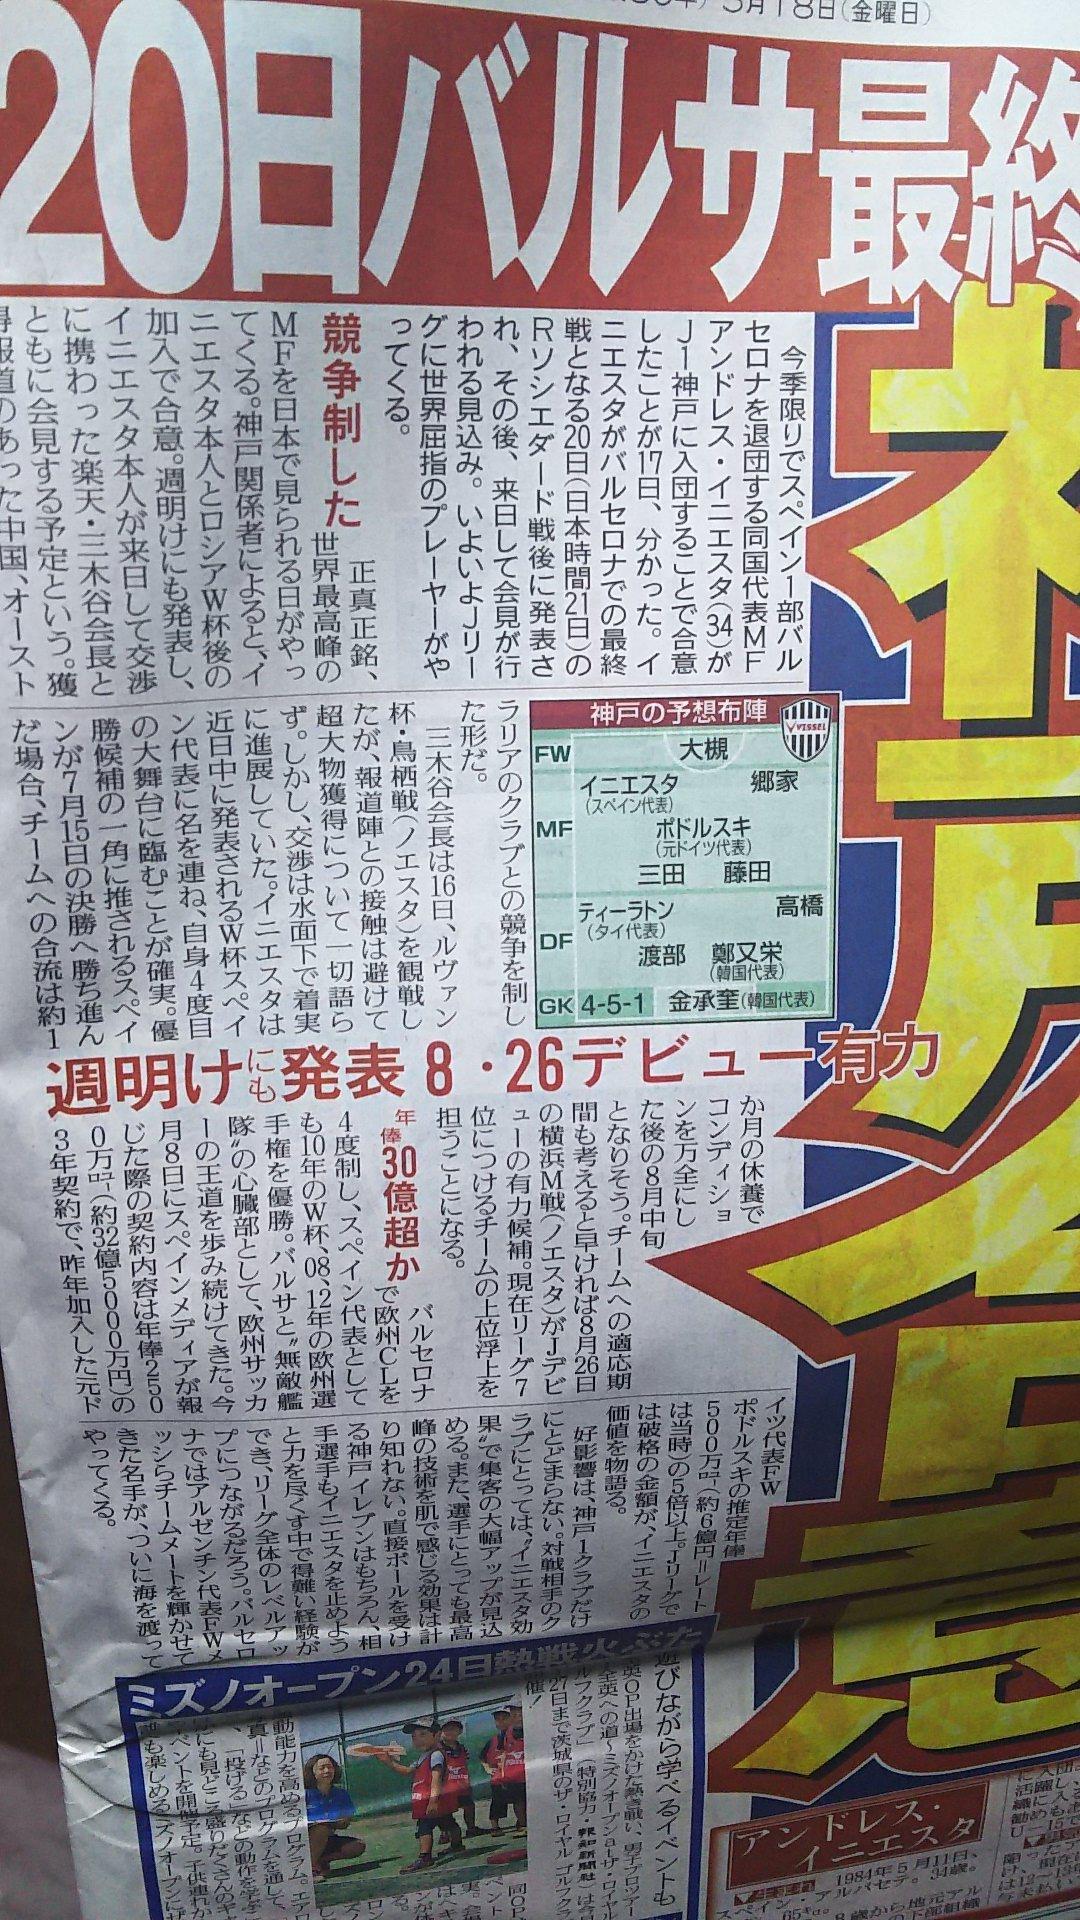 http://livedoor.blogimg.jp/kurrism/imgs/5/c/5cacd7b5.jpg